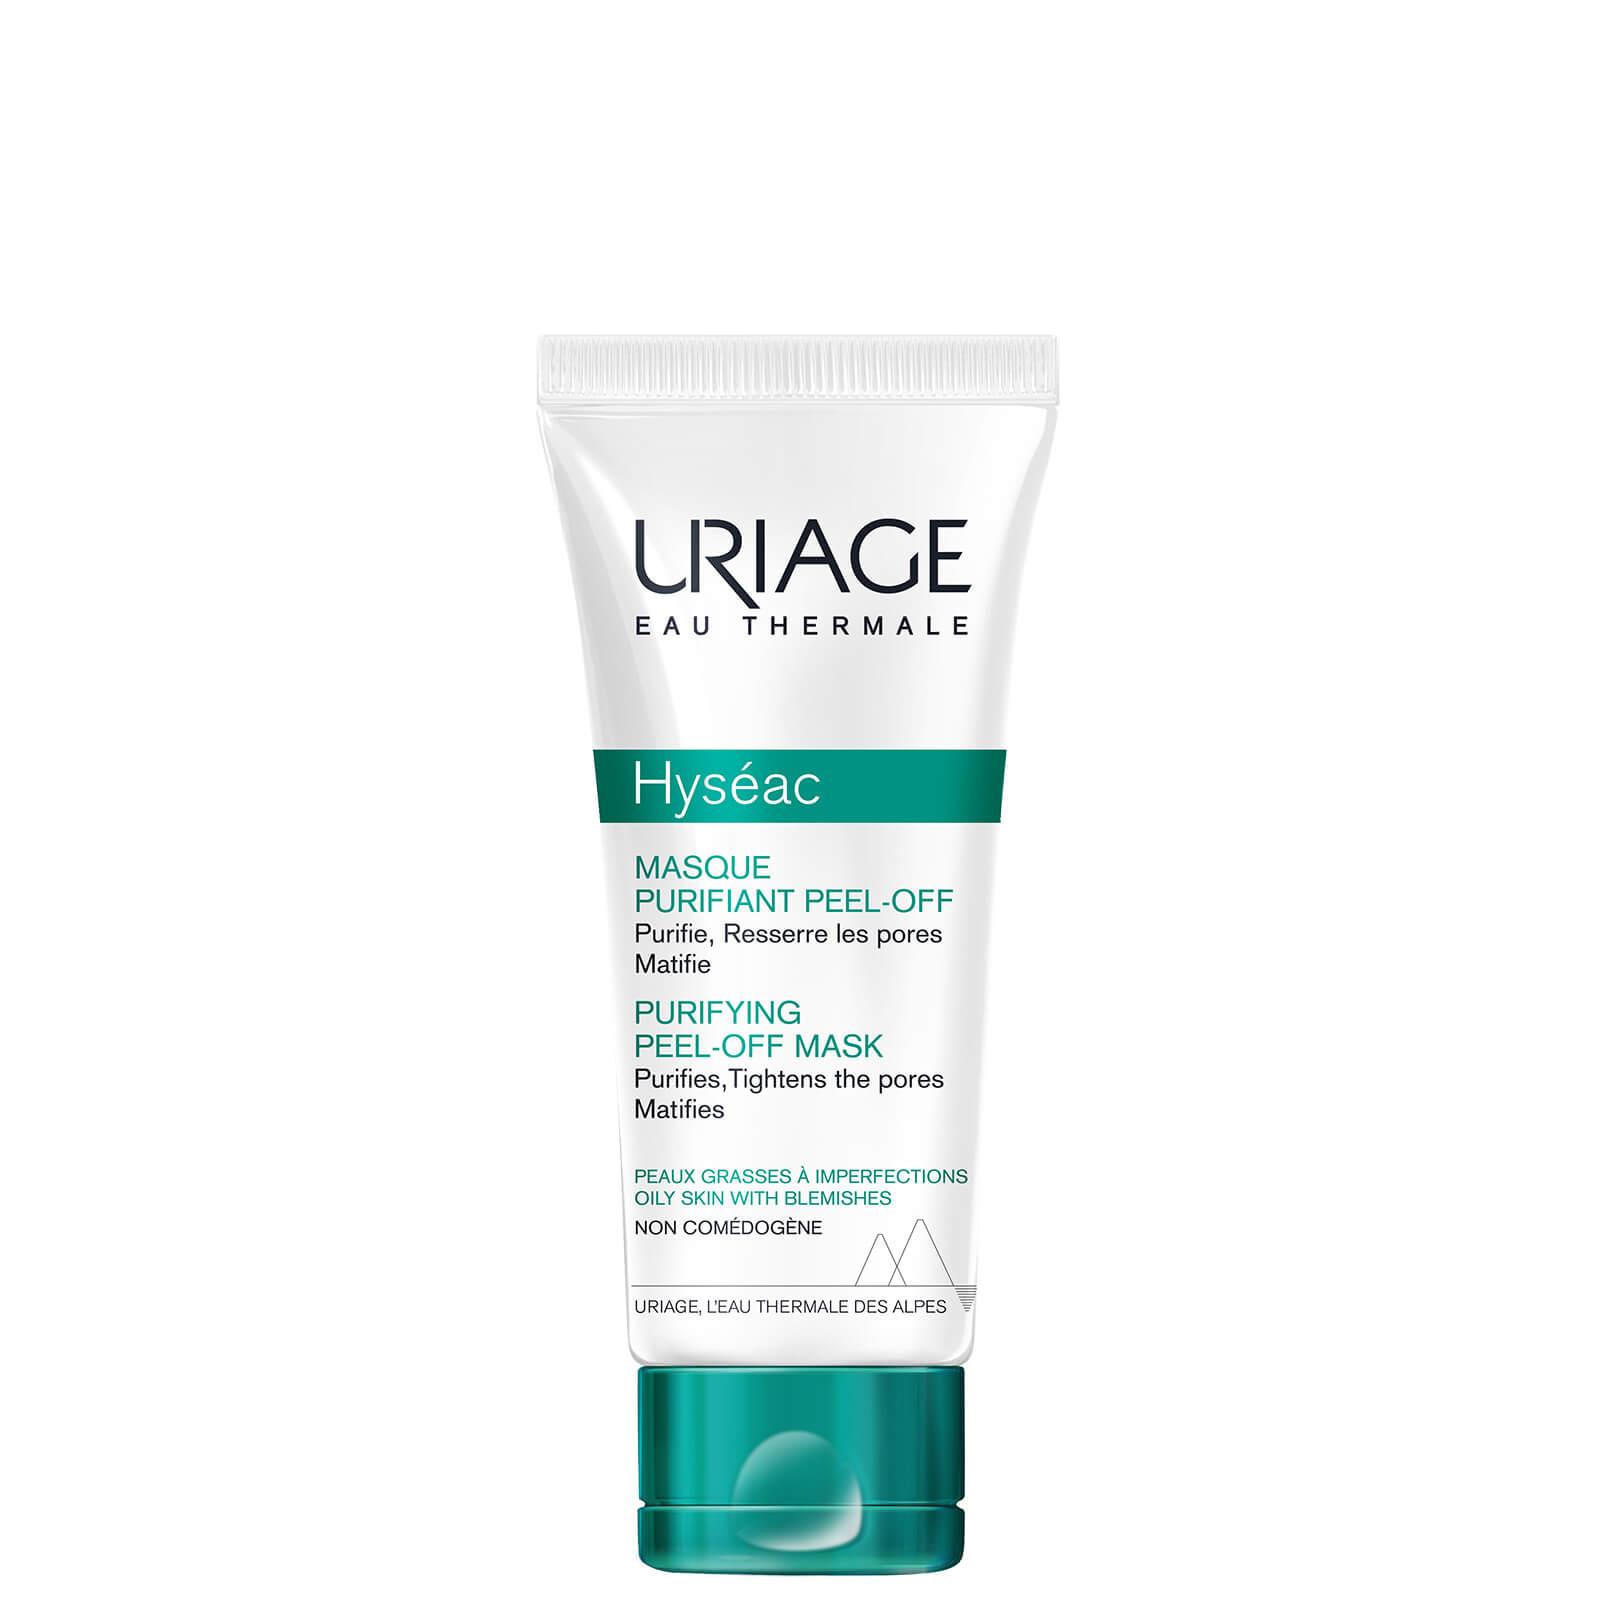 Uriage Hyséac Purifying Peel-Off Mask 50ml